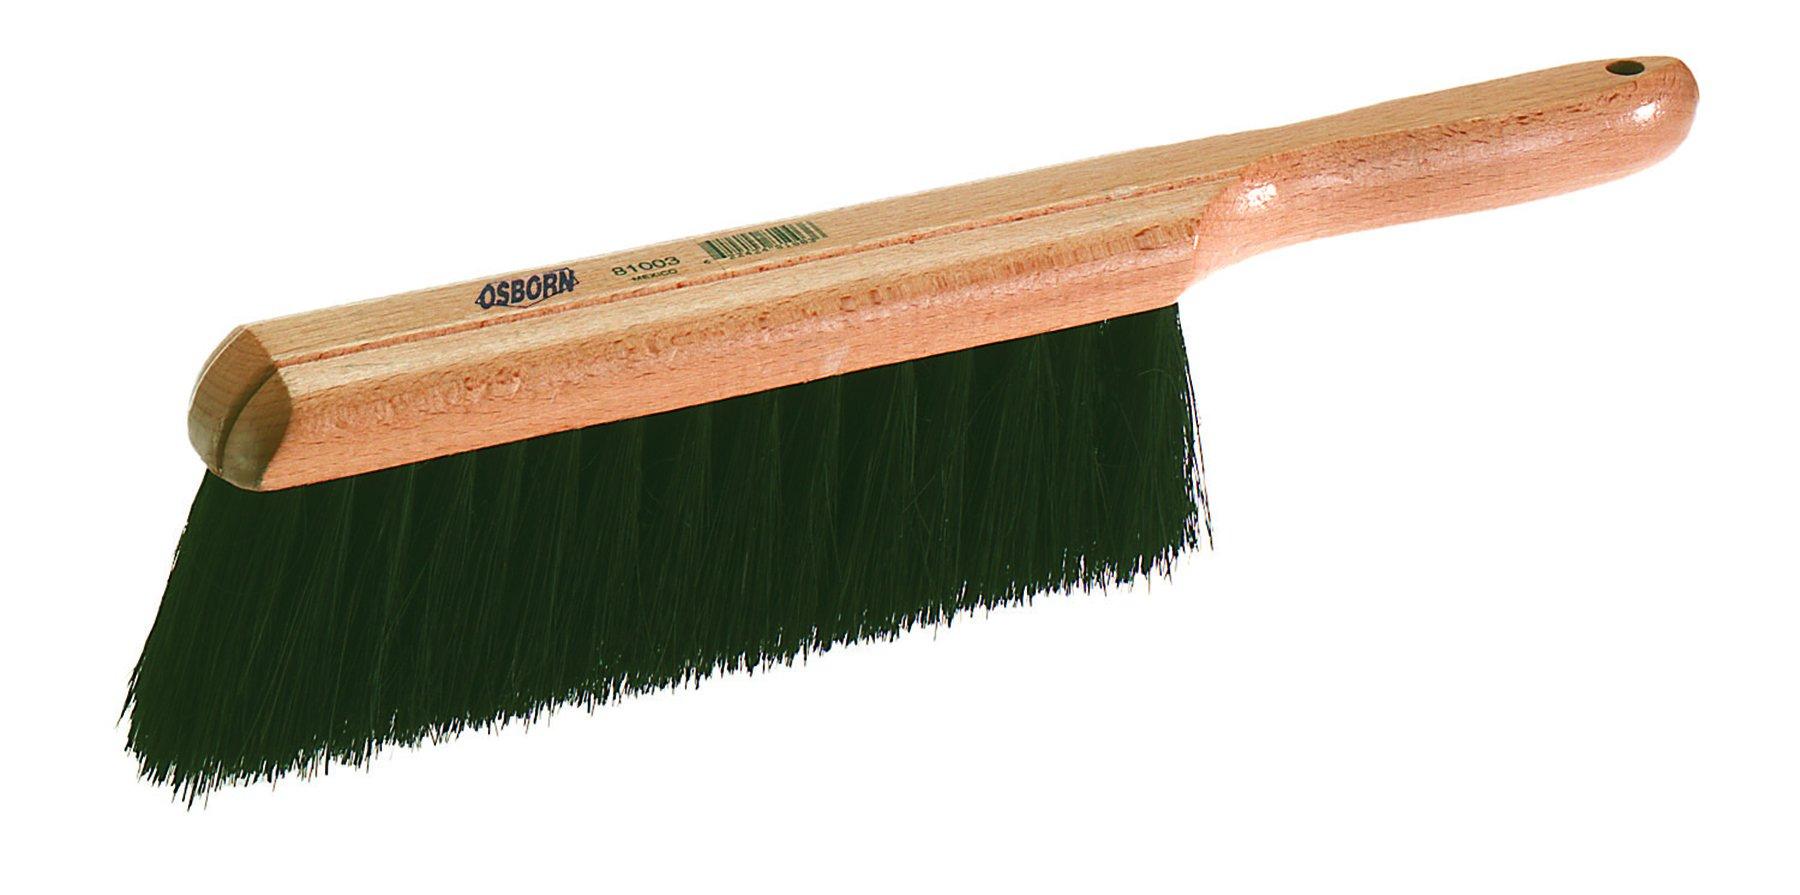 Osborn 81003 Economy Counter Duster, Black Tampico Bristle, 8'' Brush Length